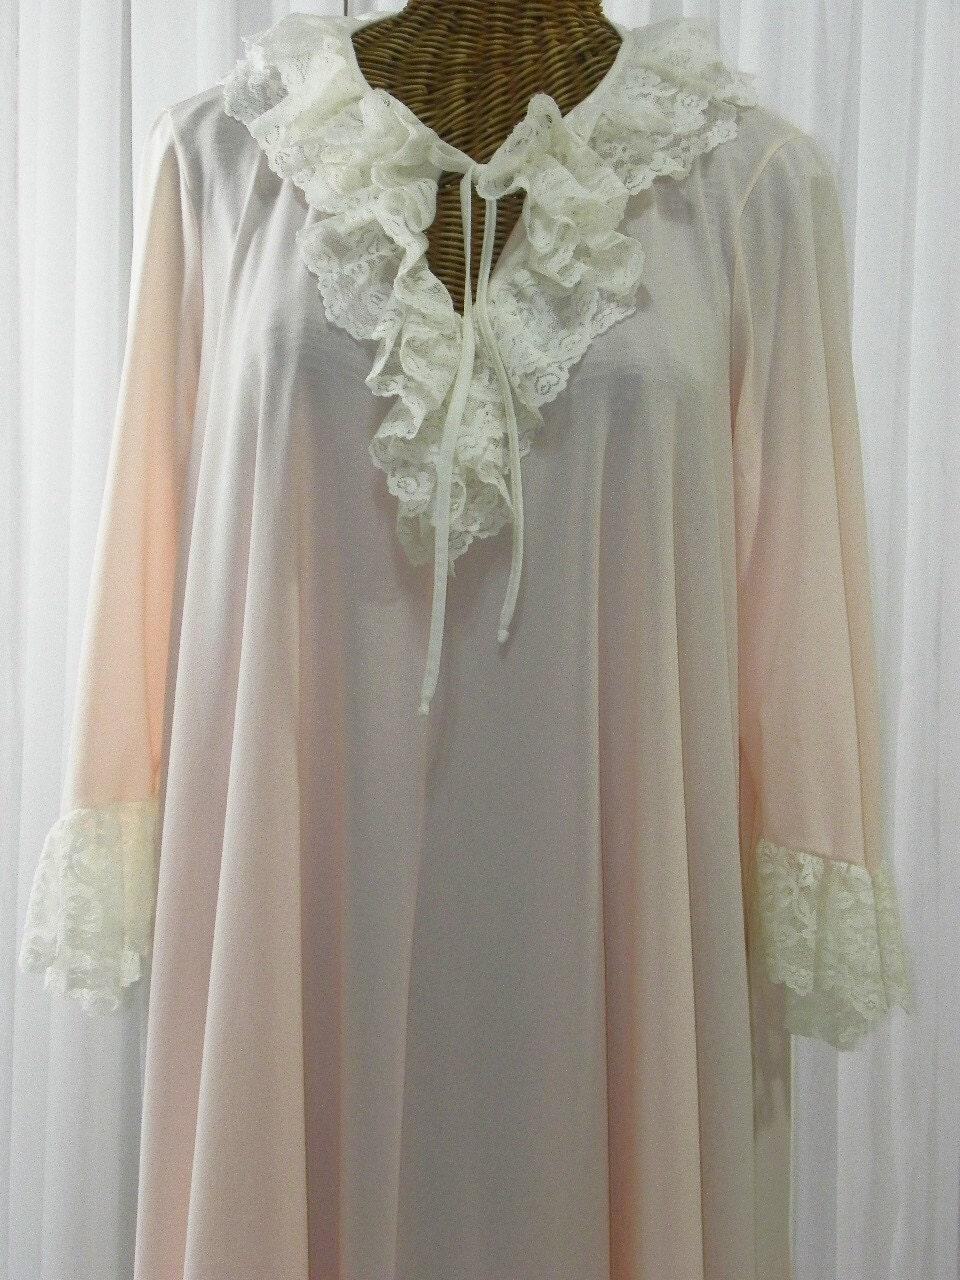 Womens Long Nightie Victorian Nightgown Sleepwear Robe